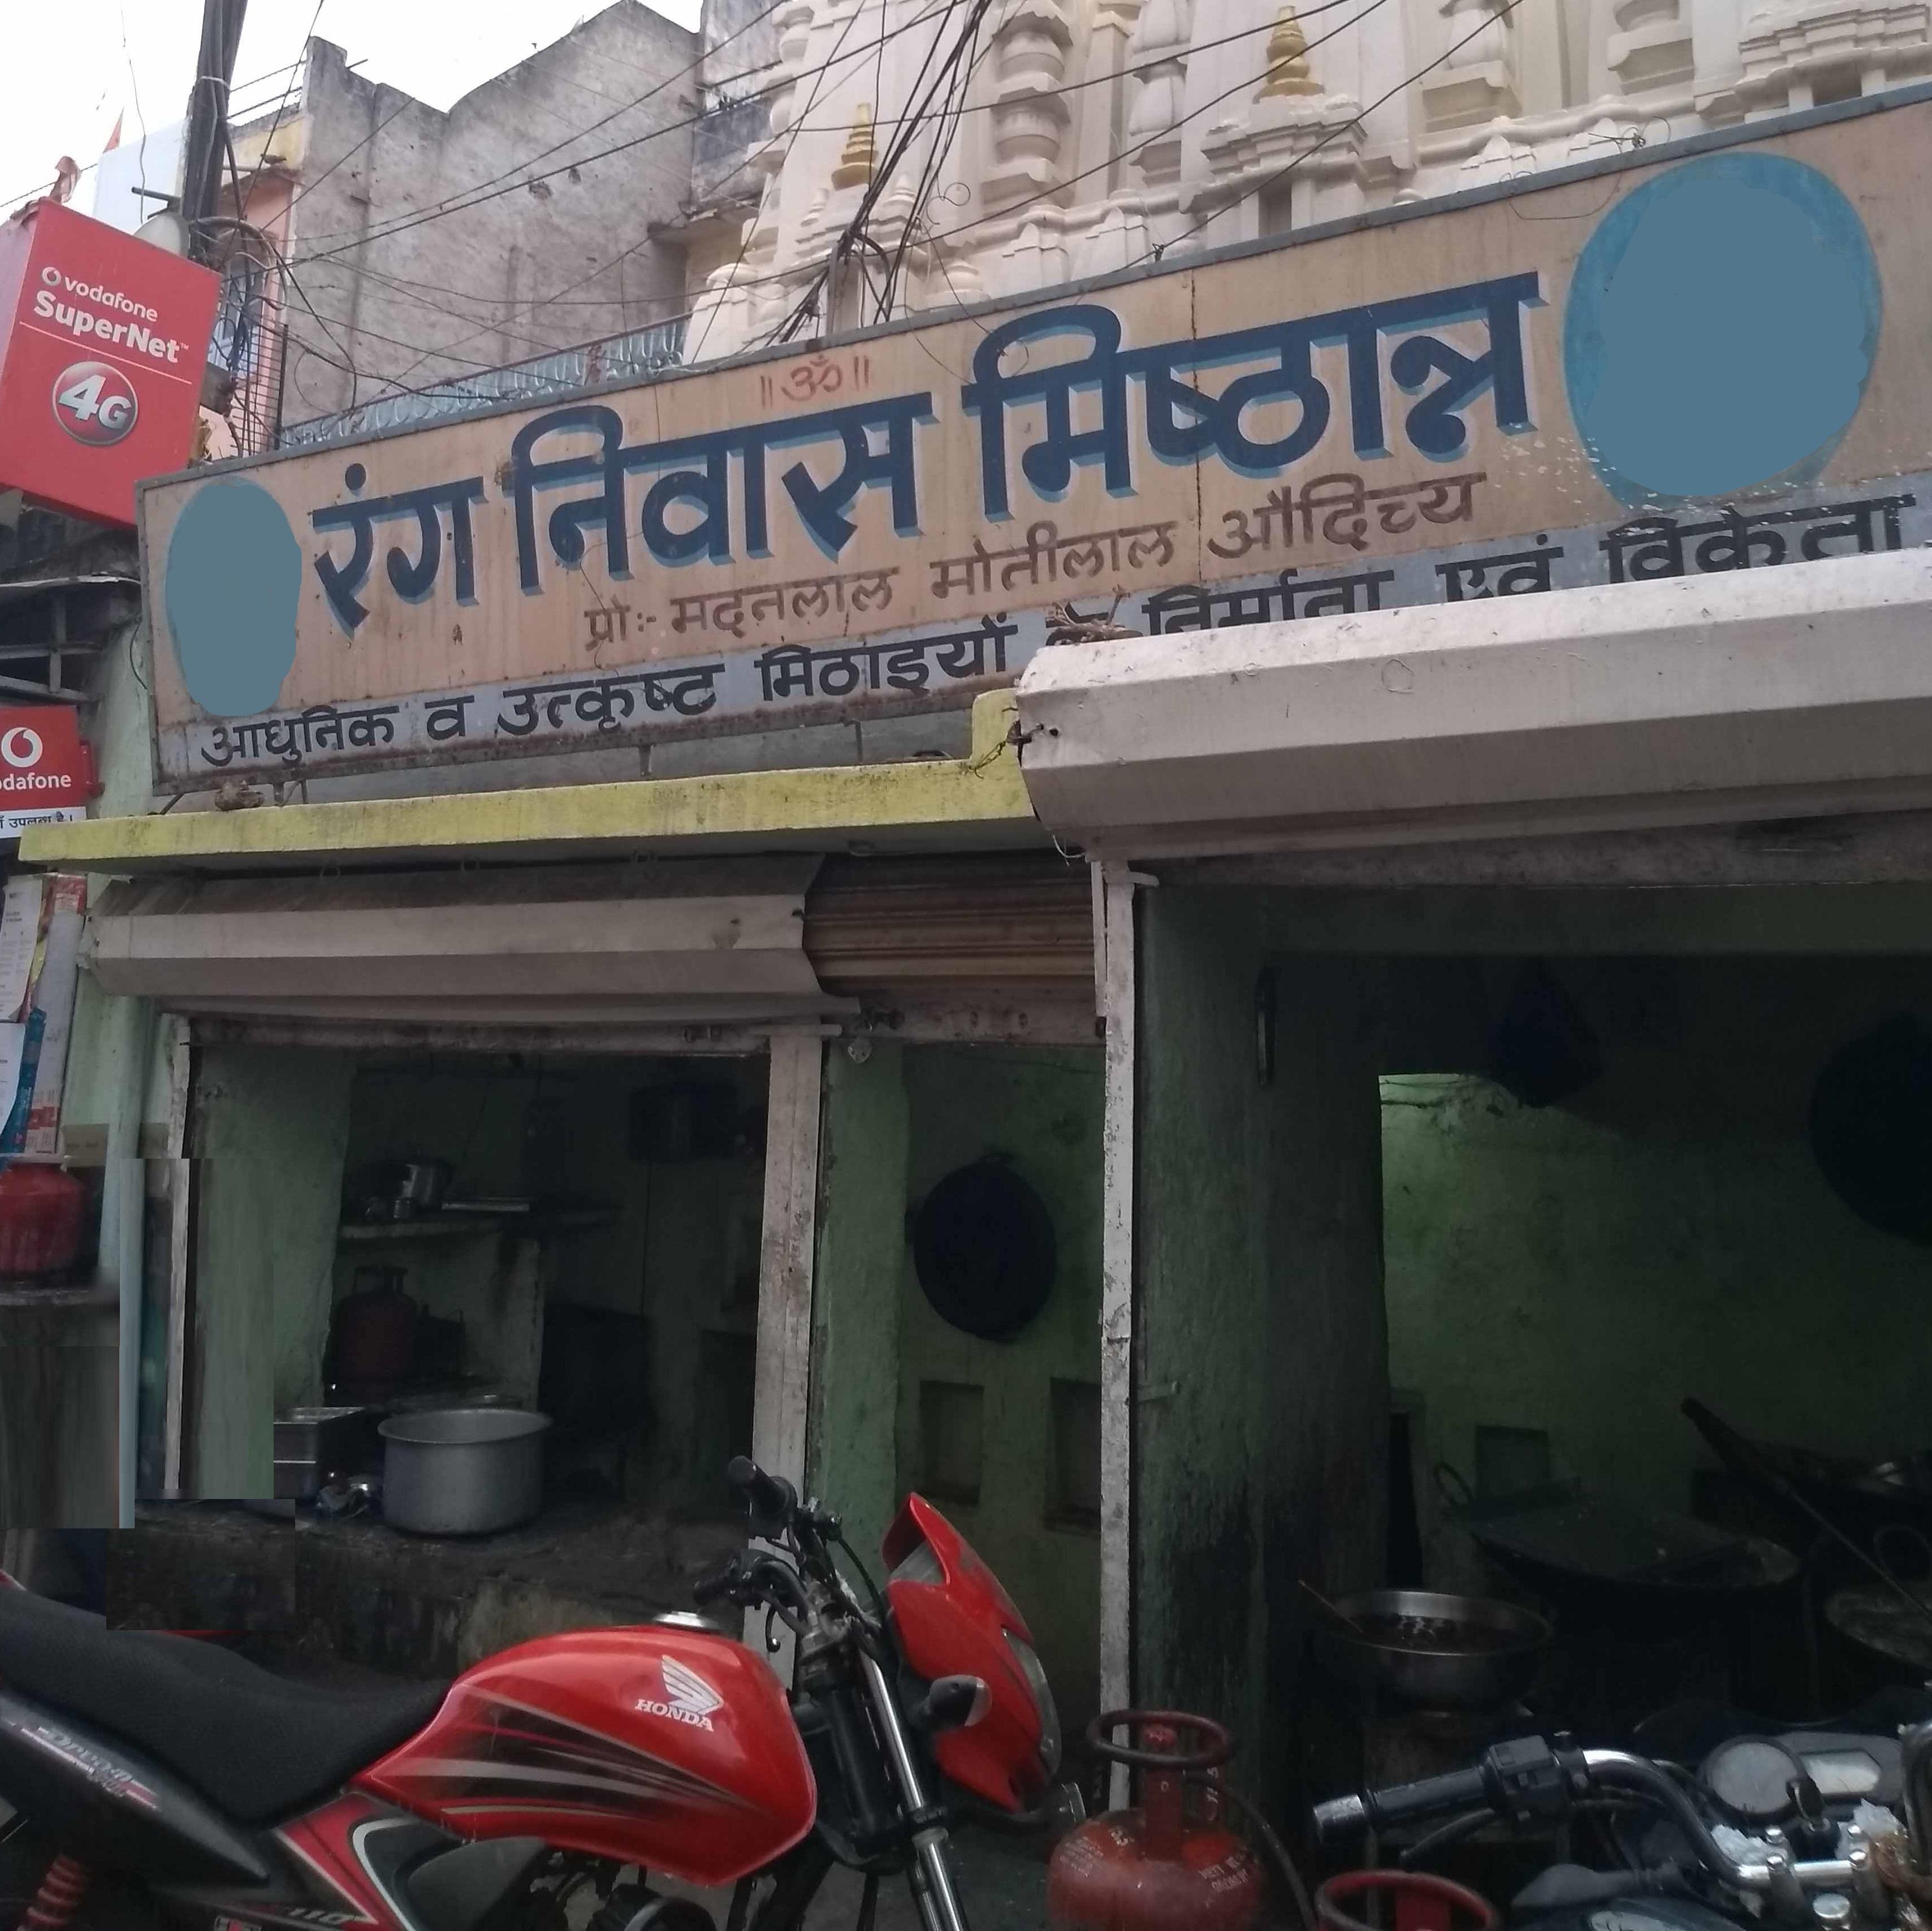 Rang Niwas Mishthan - Chandpole - Udaipur Image